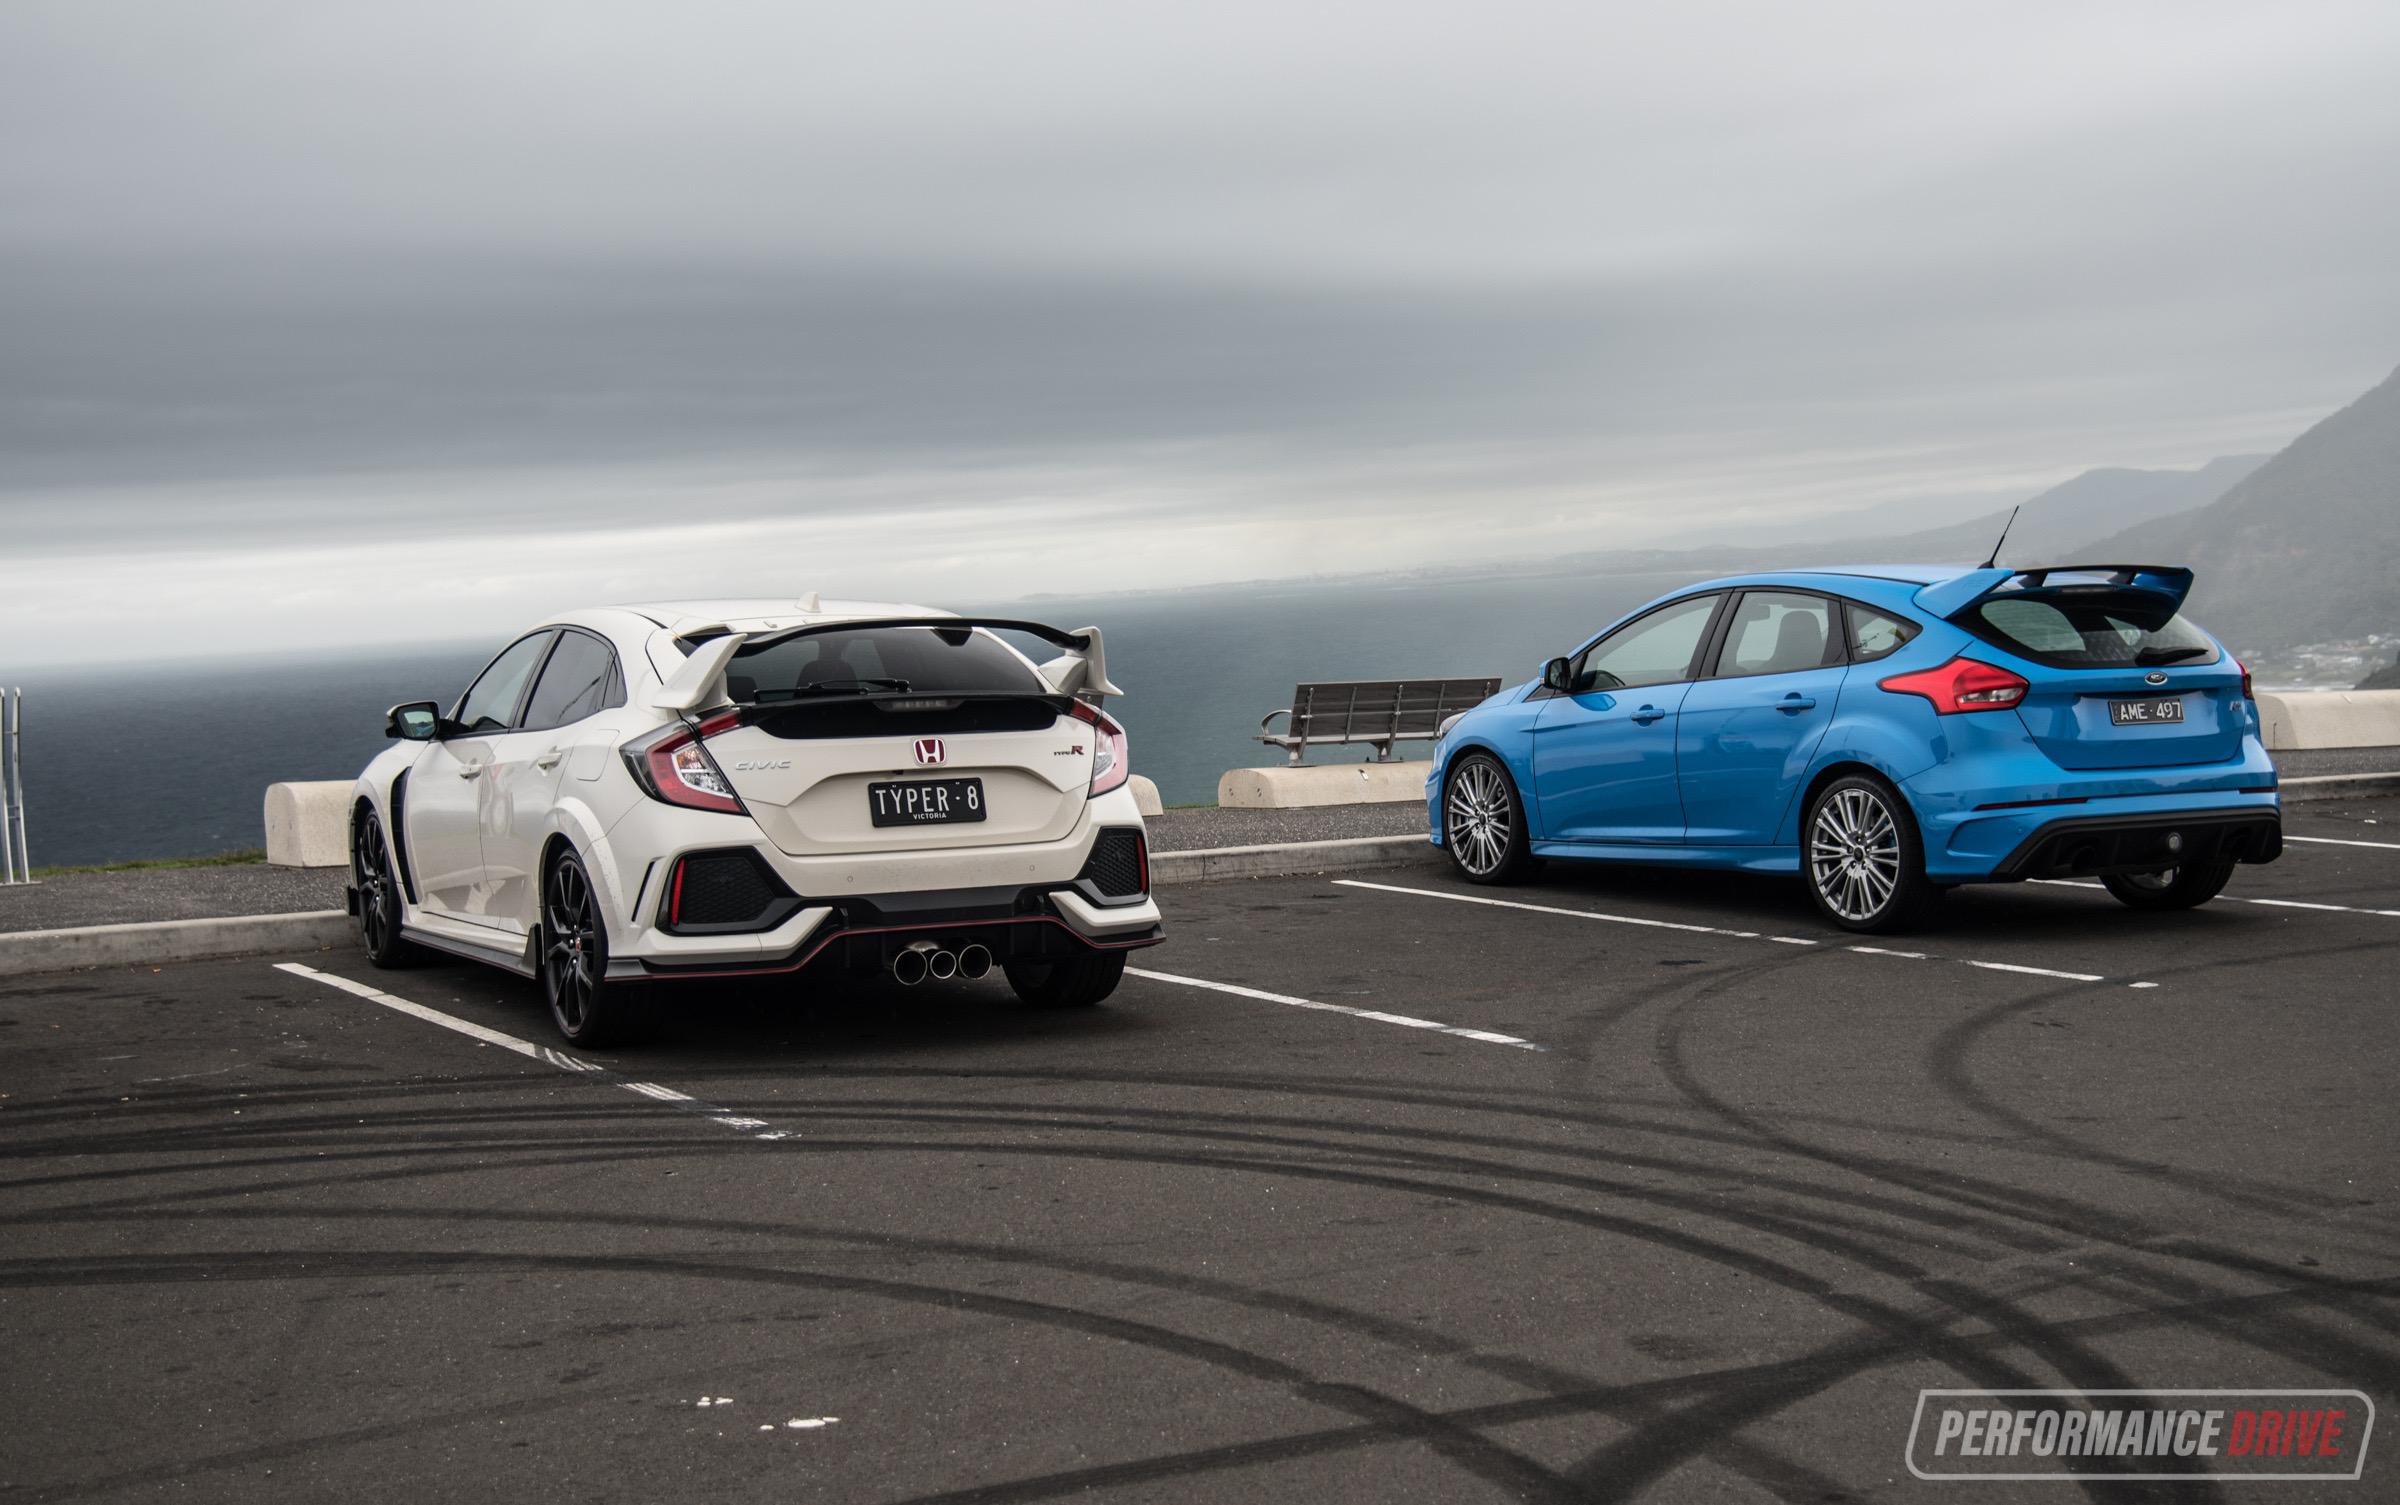 2018 Honda Civic Type R Vs Ford Focus Rs Hot Hatch Comparison